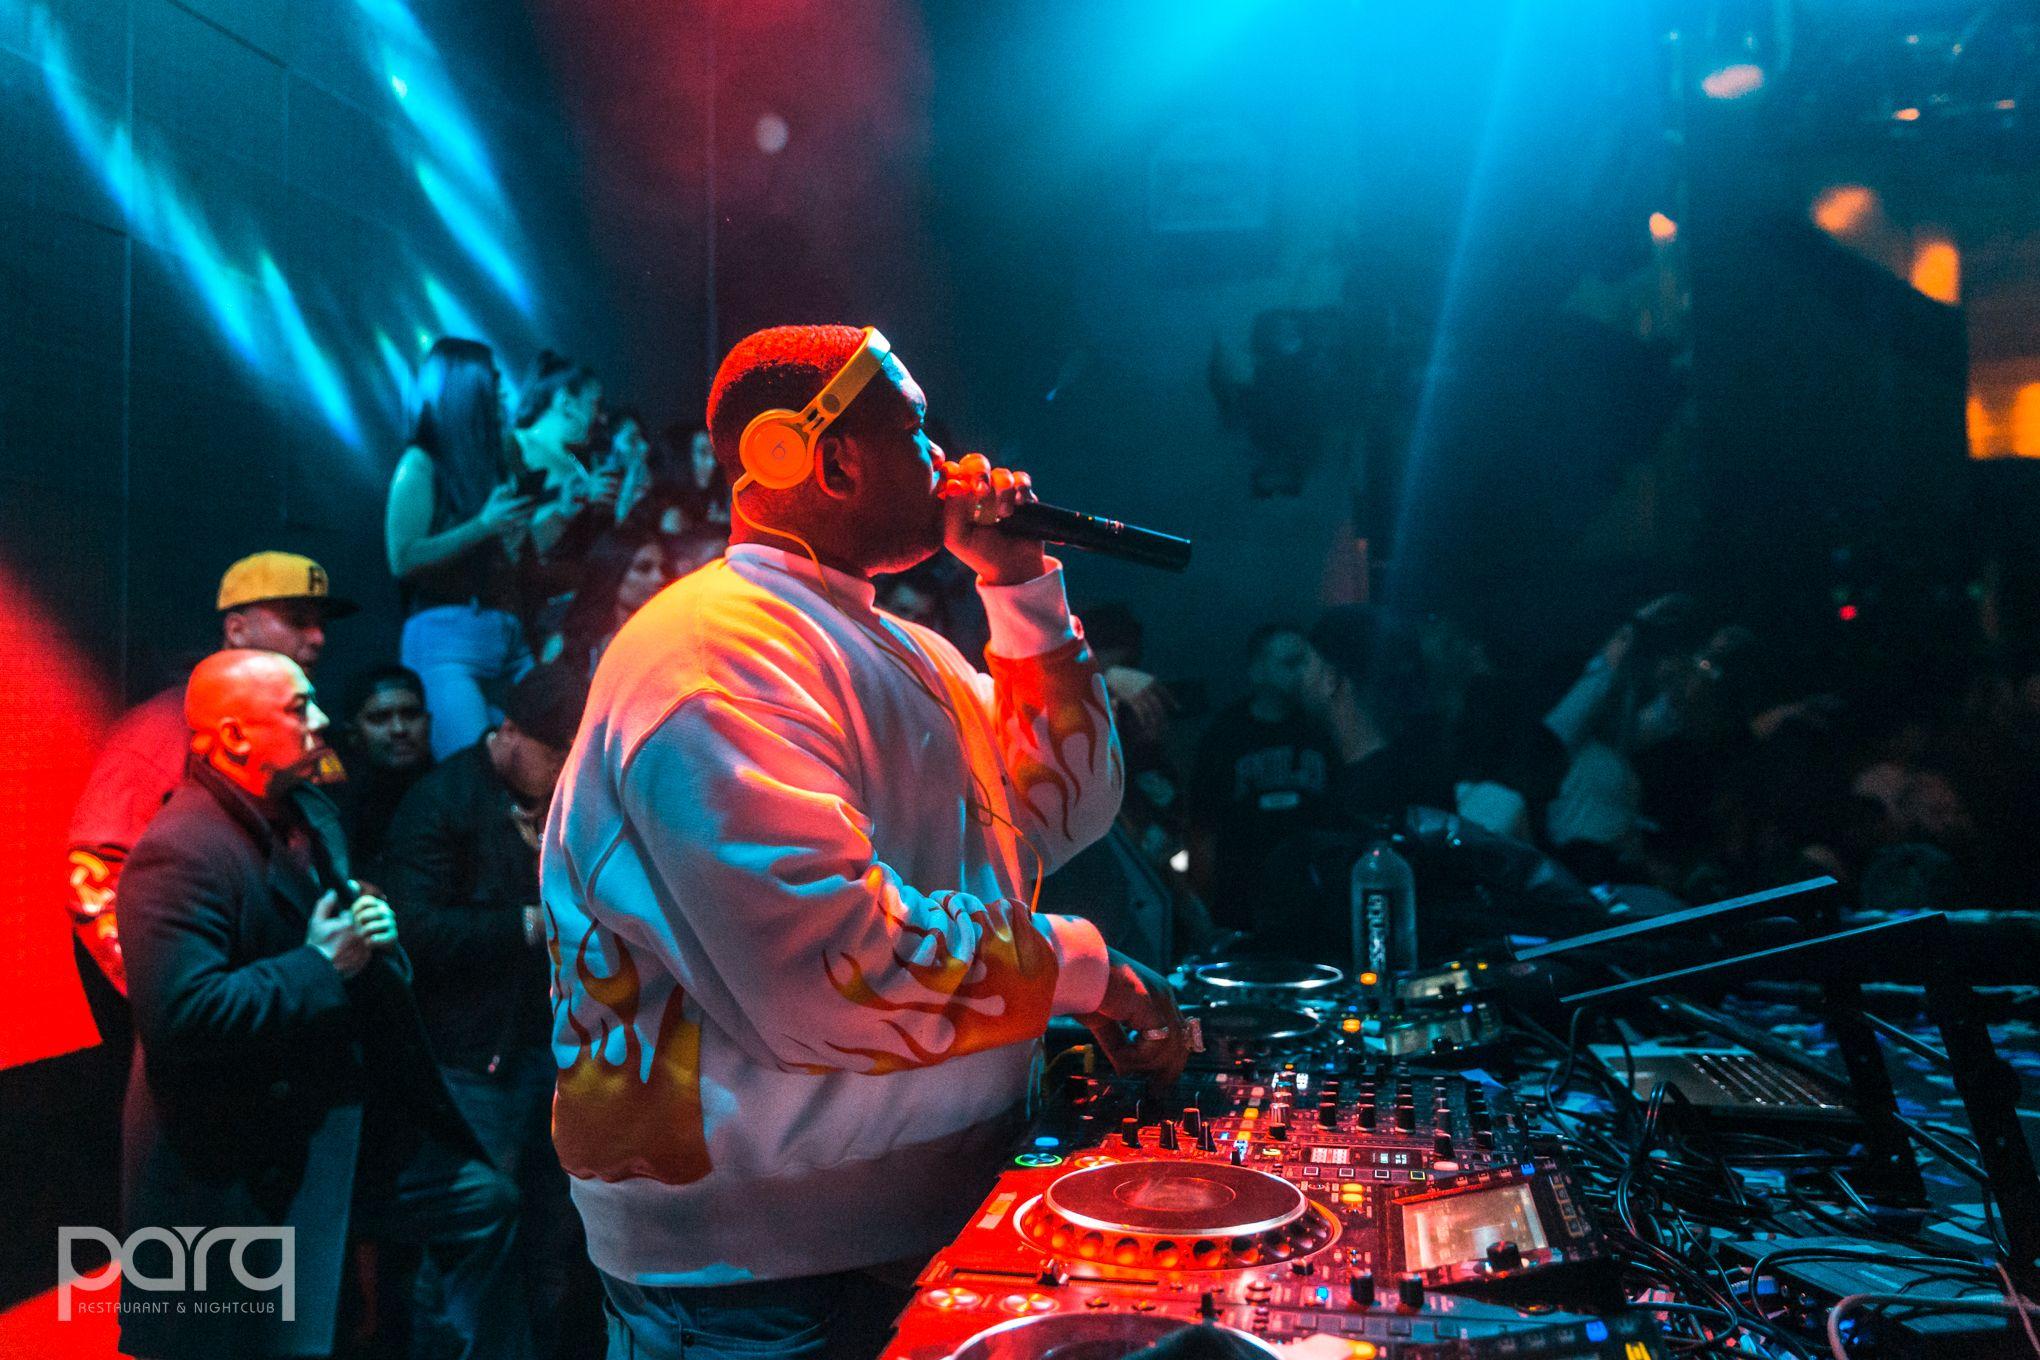 11.27.19 Parq - DJ Mustard-15.jpg